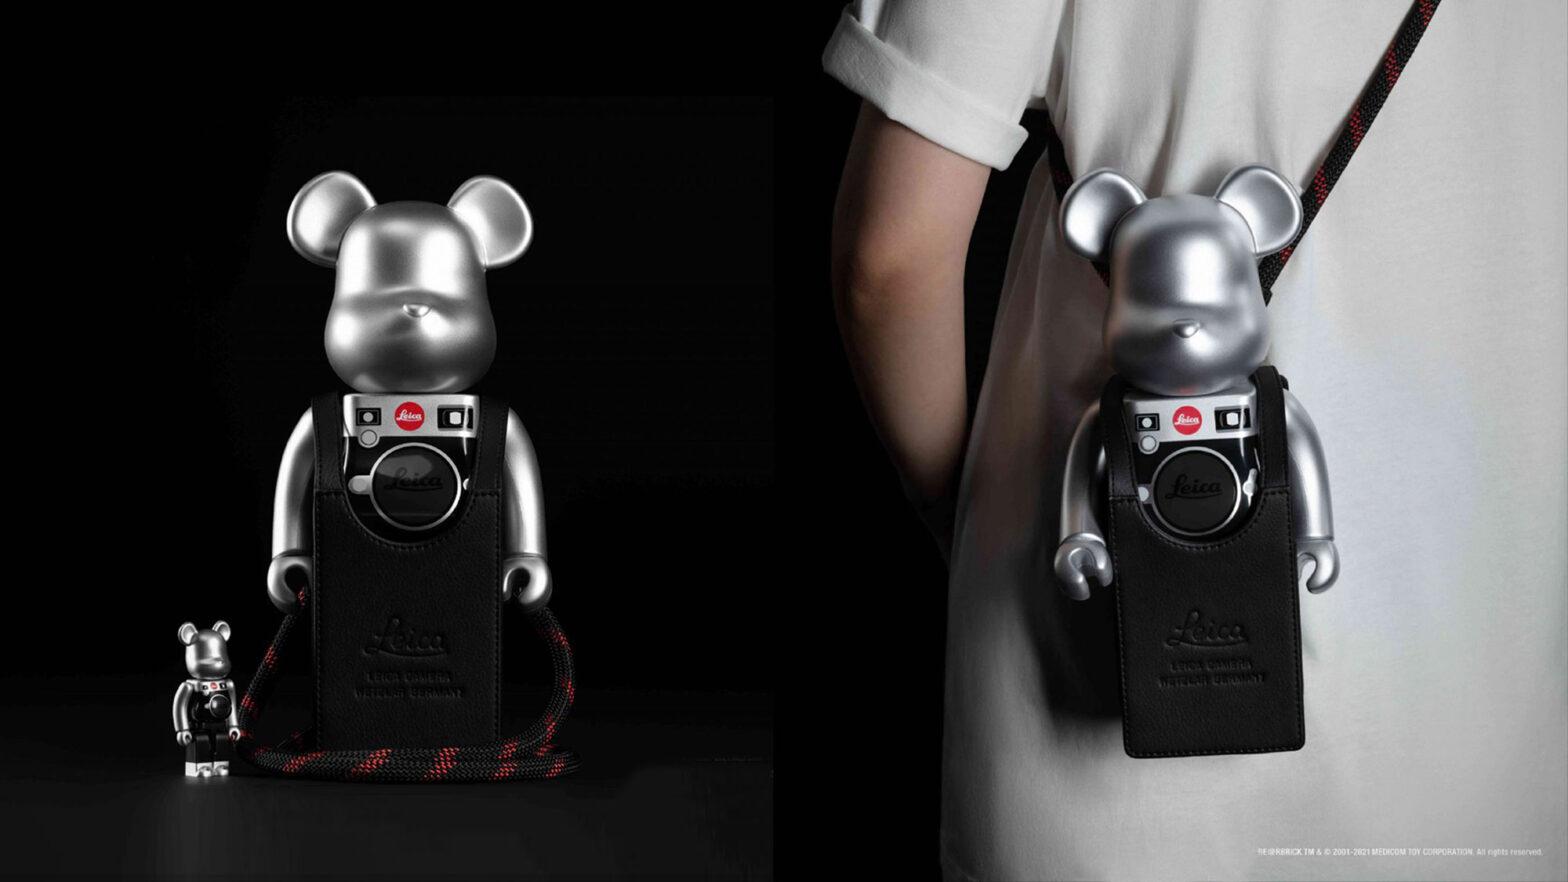 Leica x Medicom Bearbrick Figure